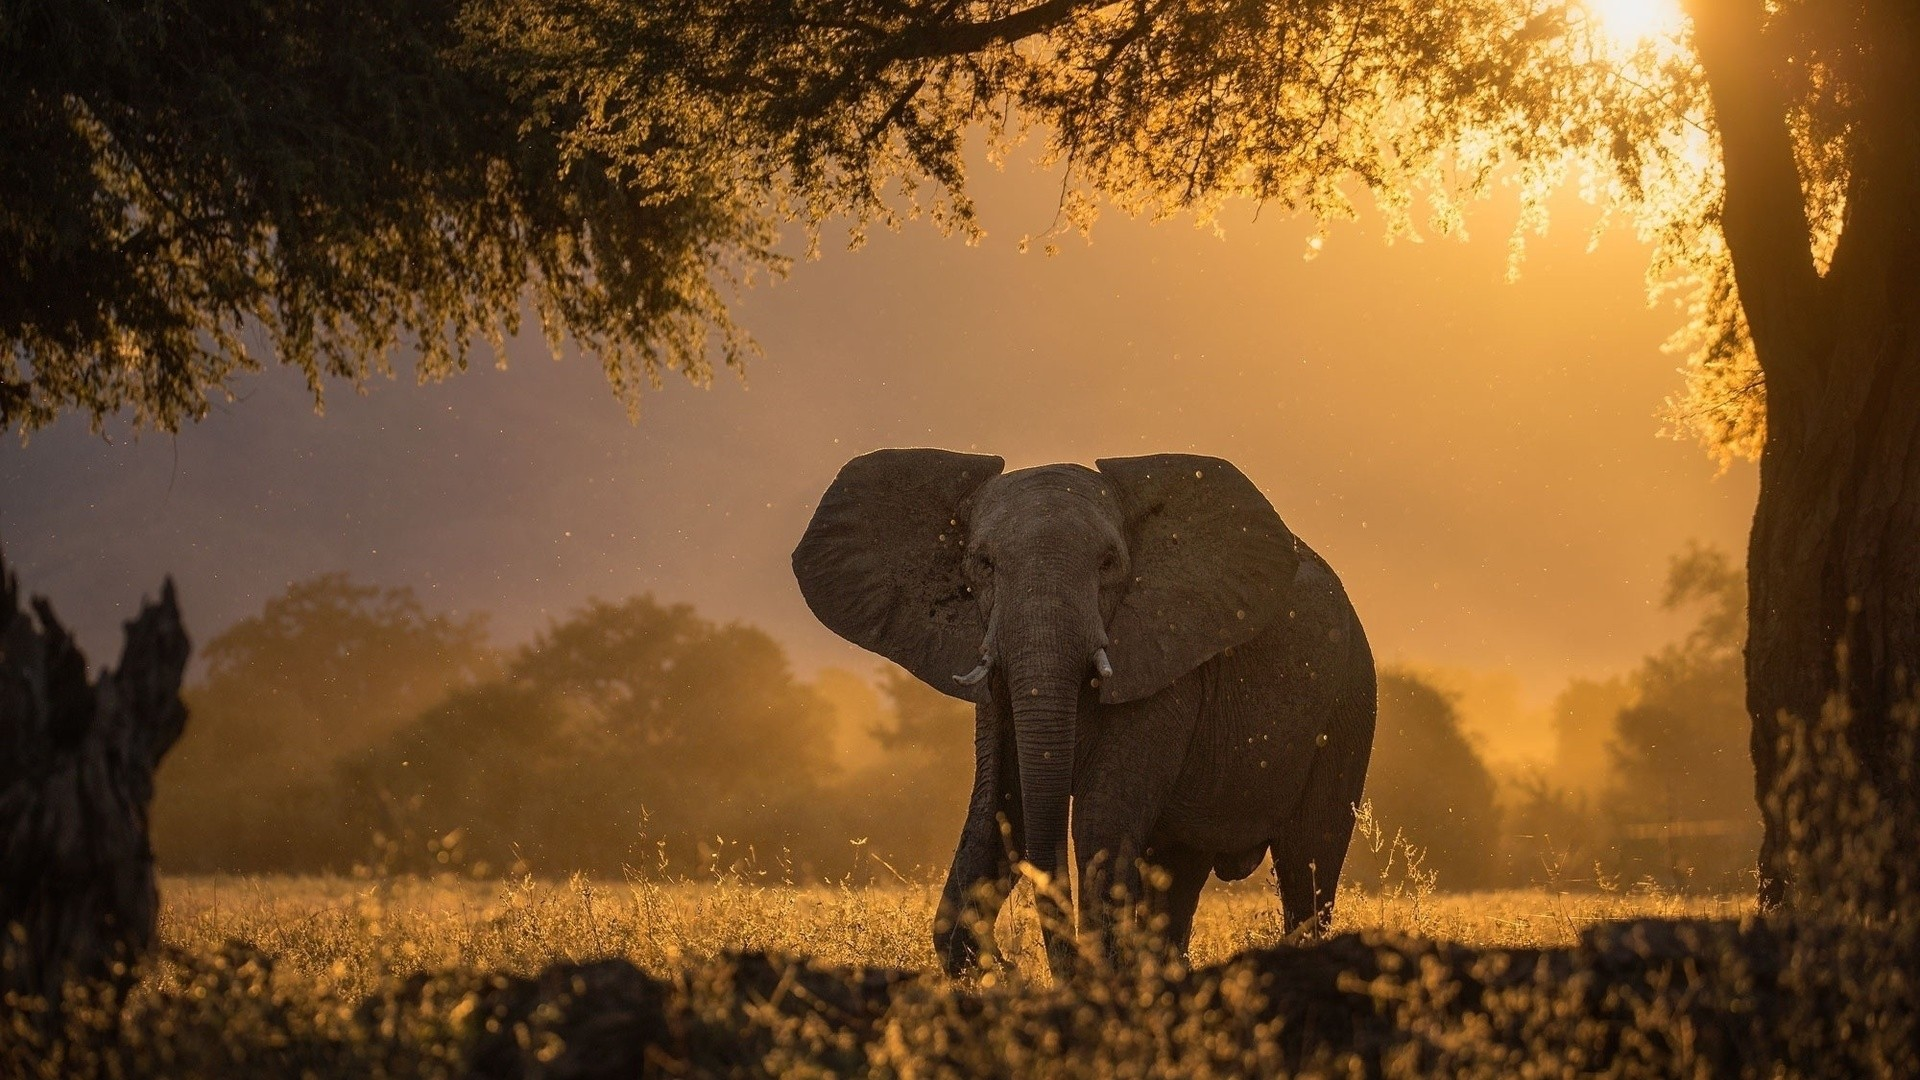 Africa Wallpaper image hd